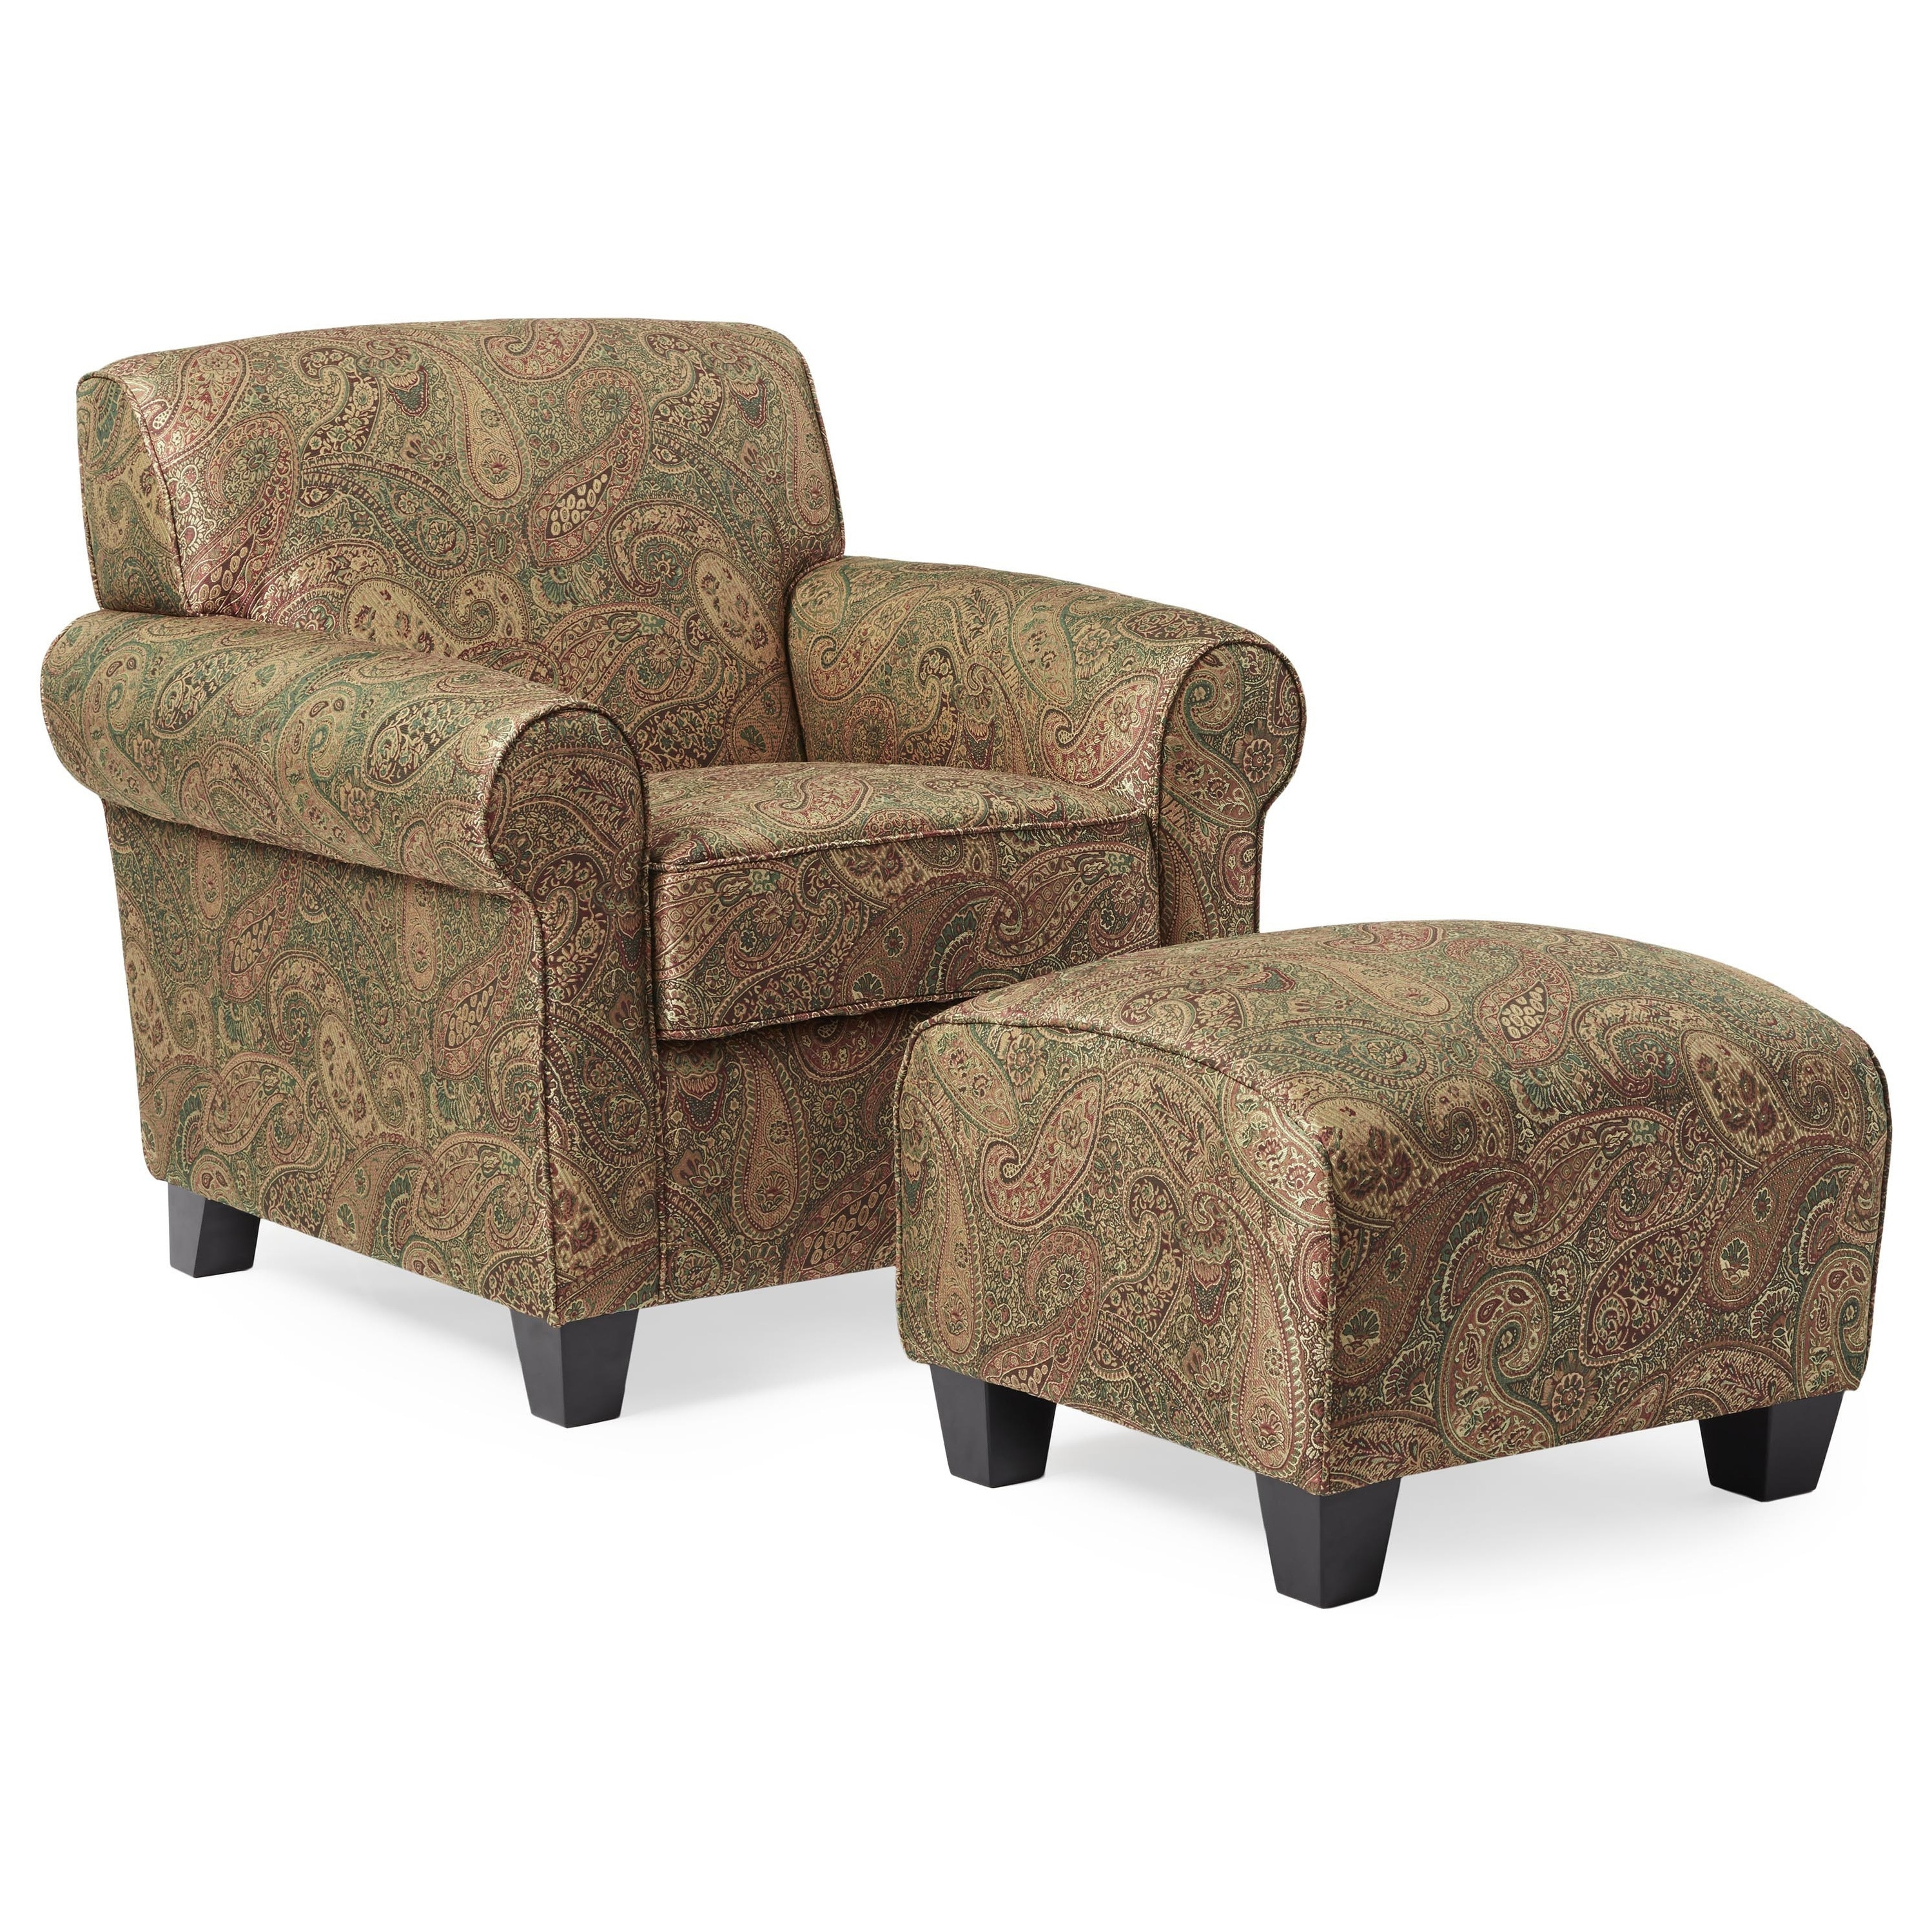 Handy Living Portfolio Mira 8 way Hand tied Paisley Arm Chair and